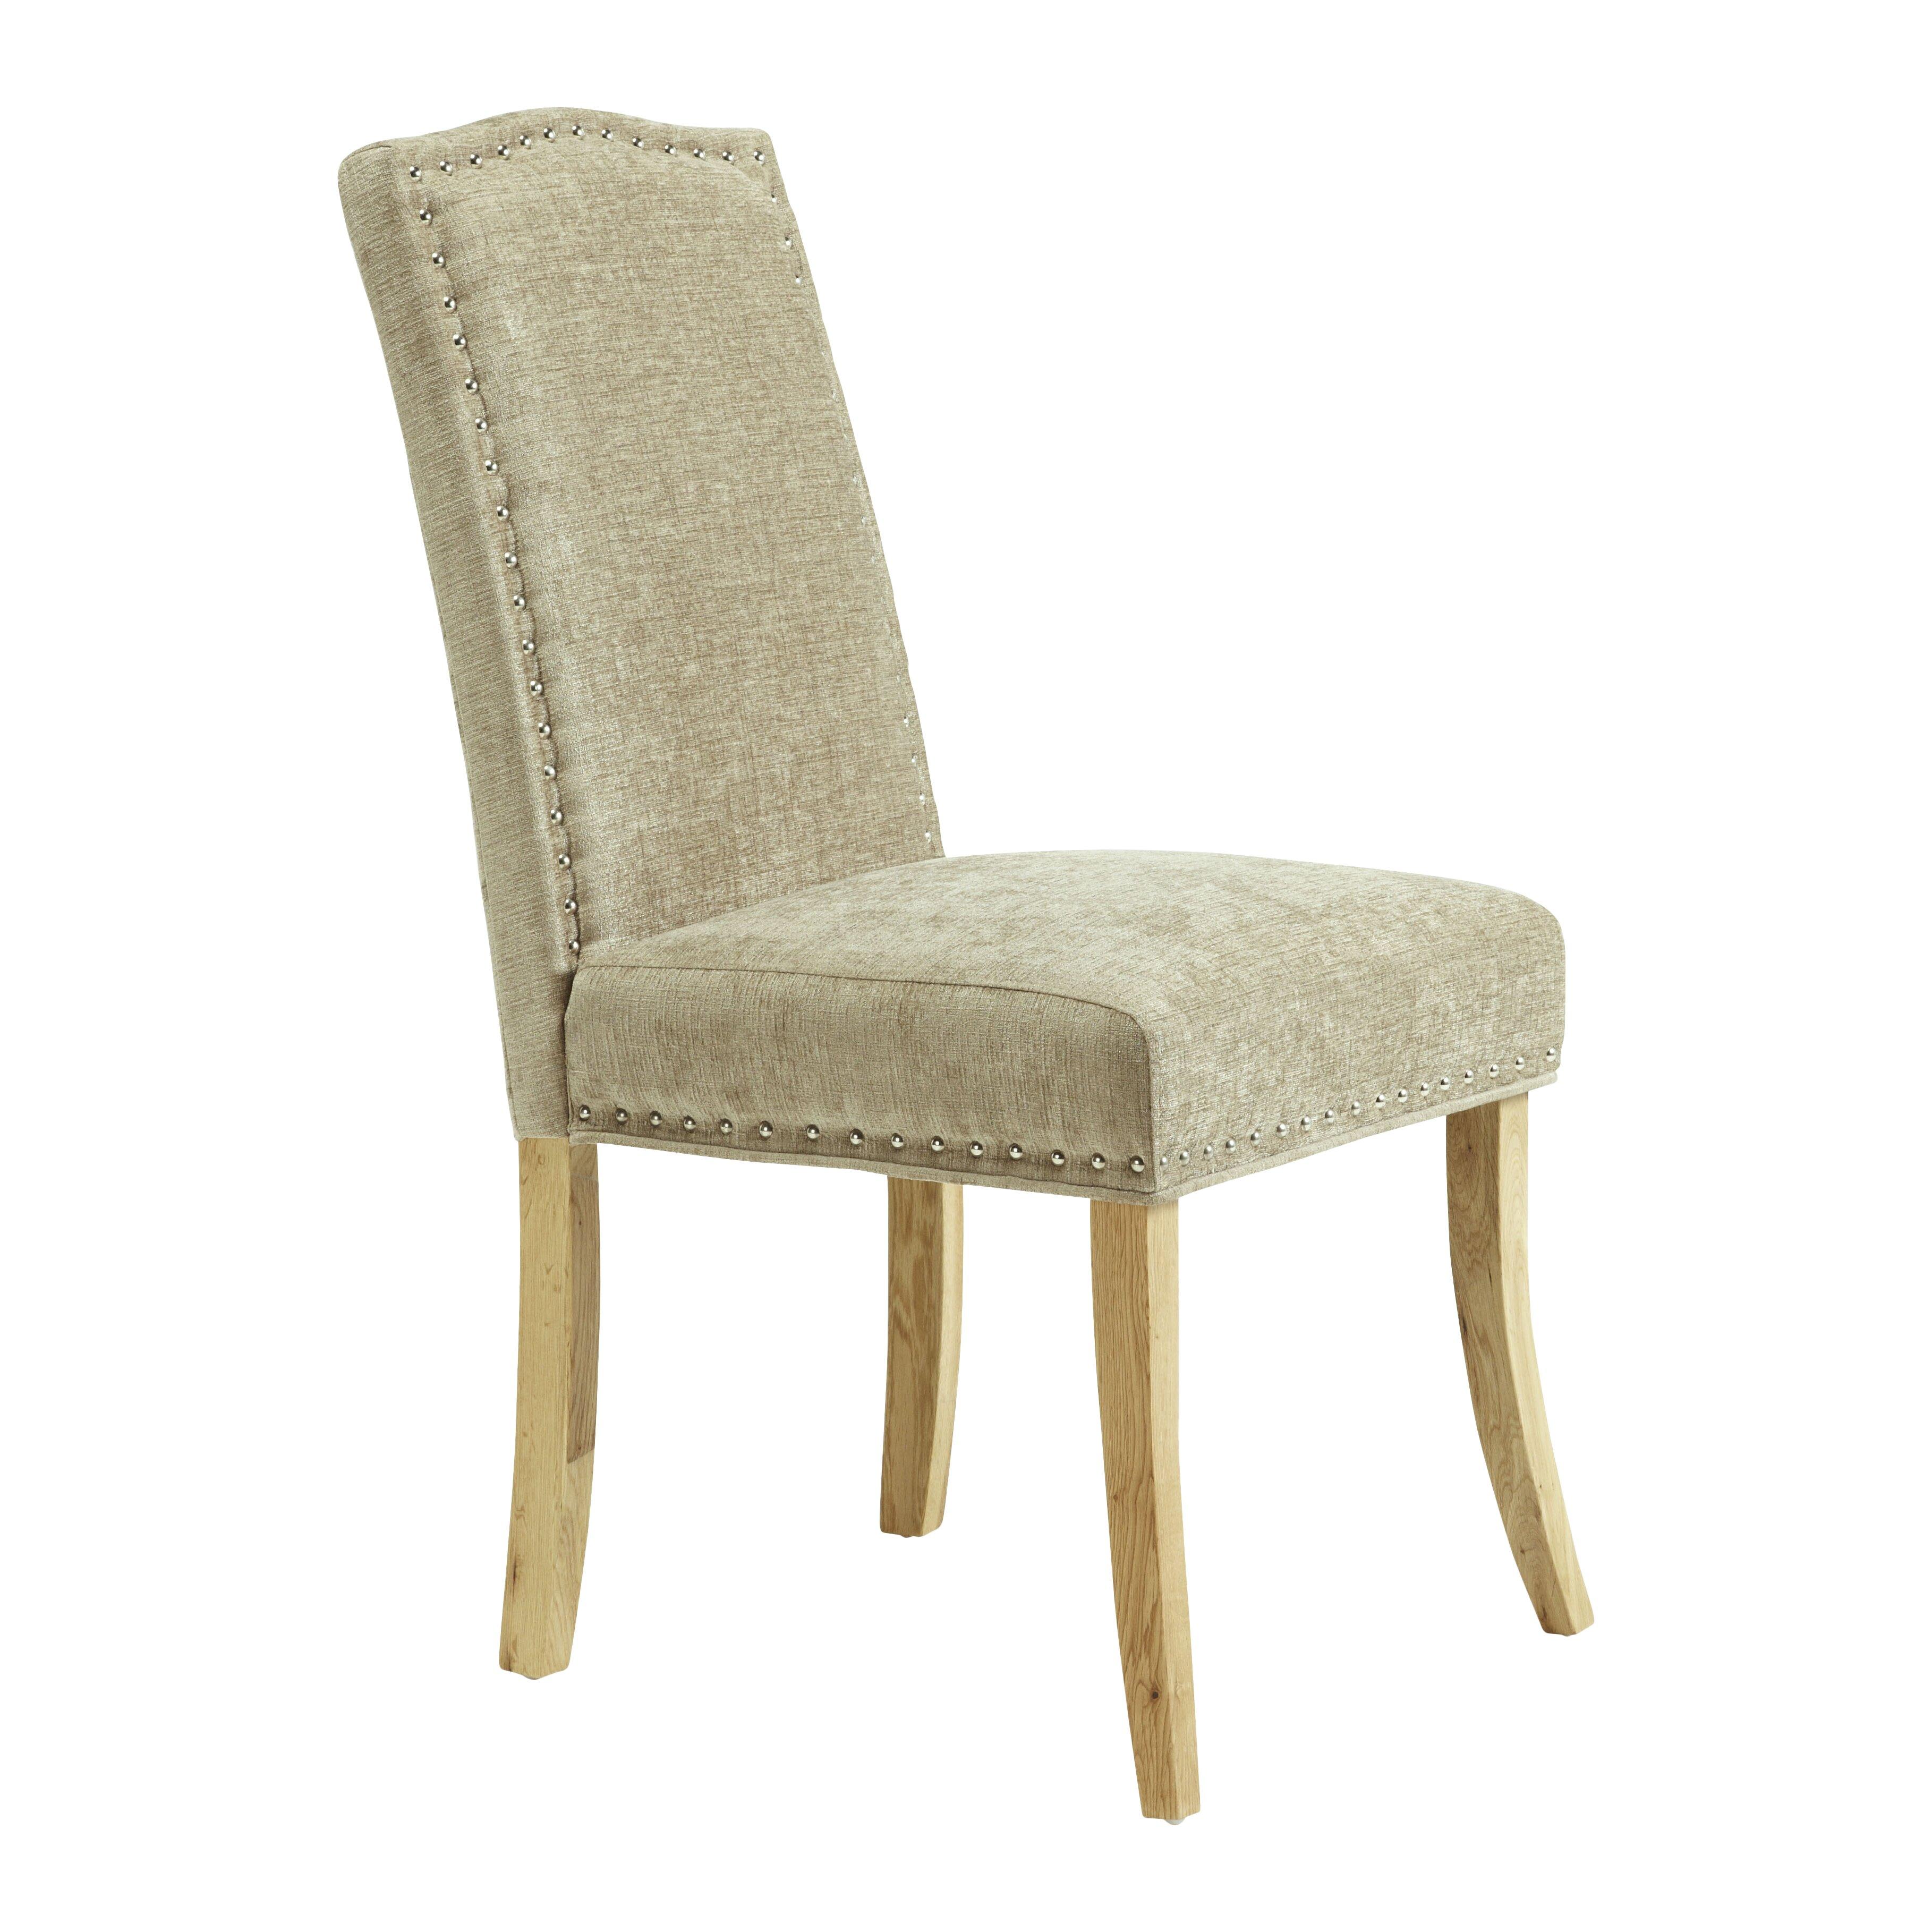 Fairmont park looe solid oak upholstered dining chair for Upholstered dining chairs